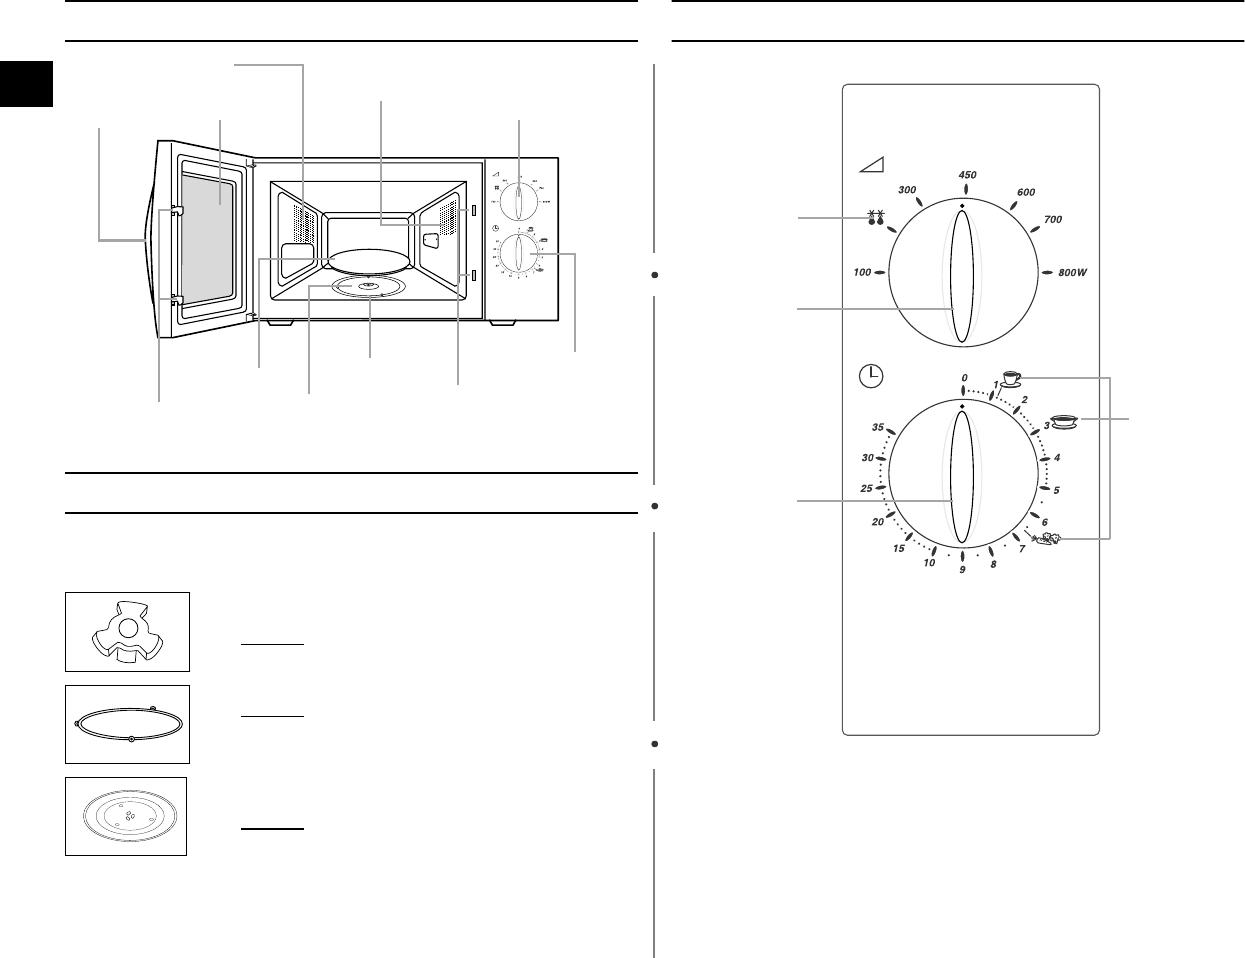 Samsung M1719N 20030321115236640 DE68 02249G